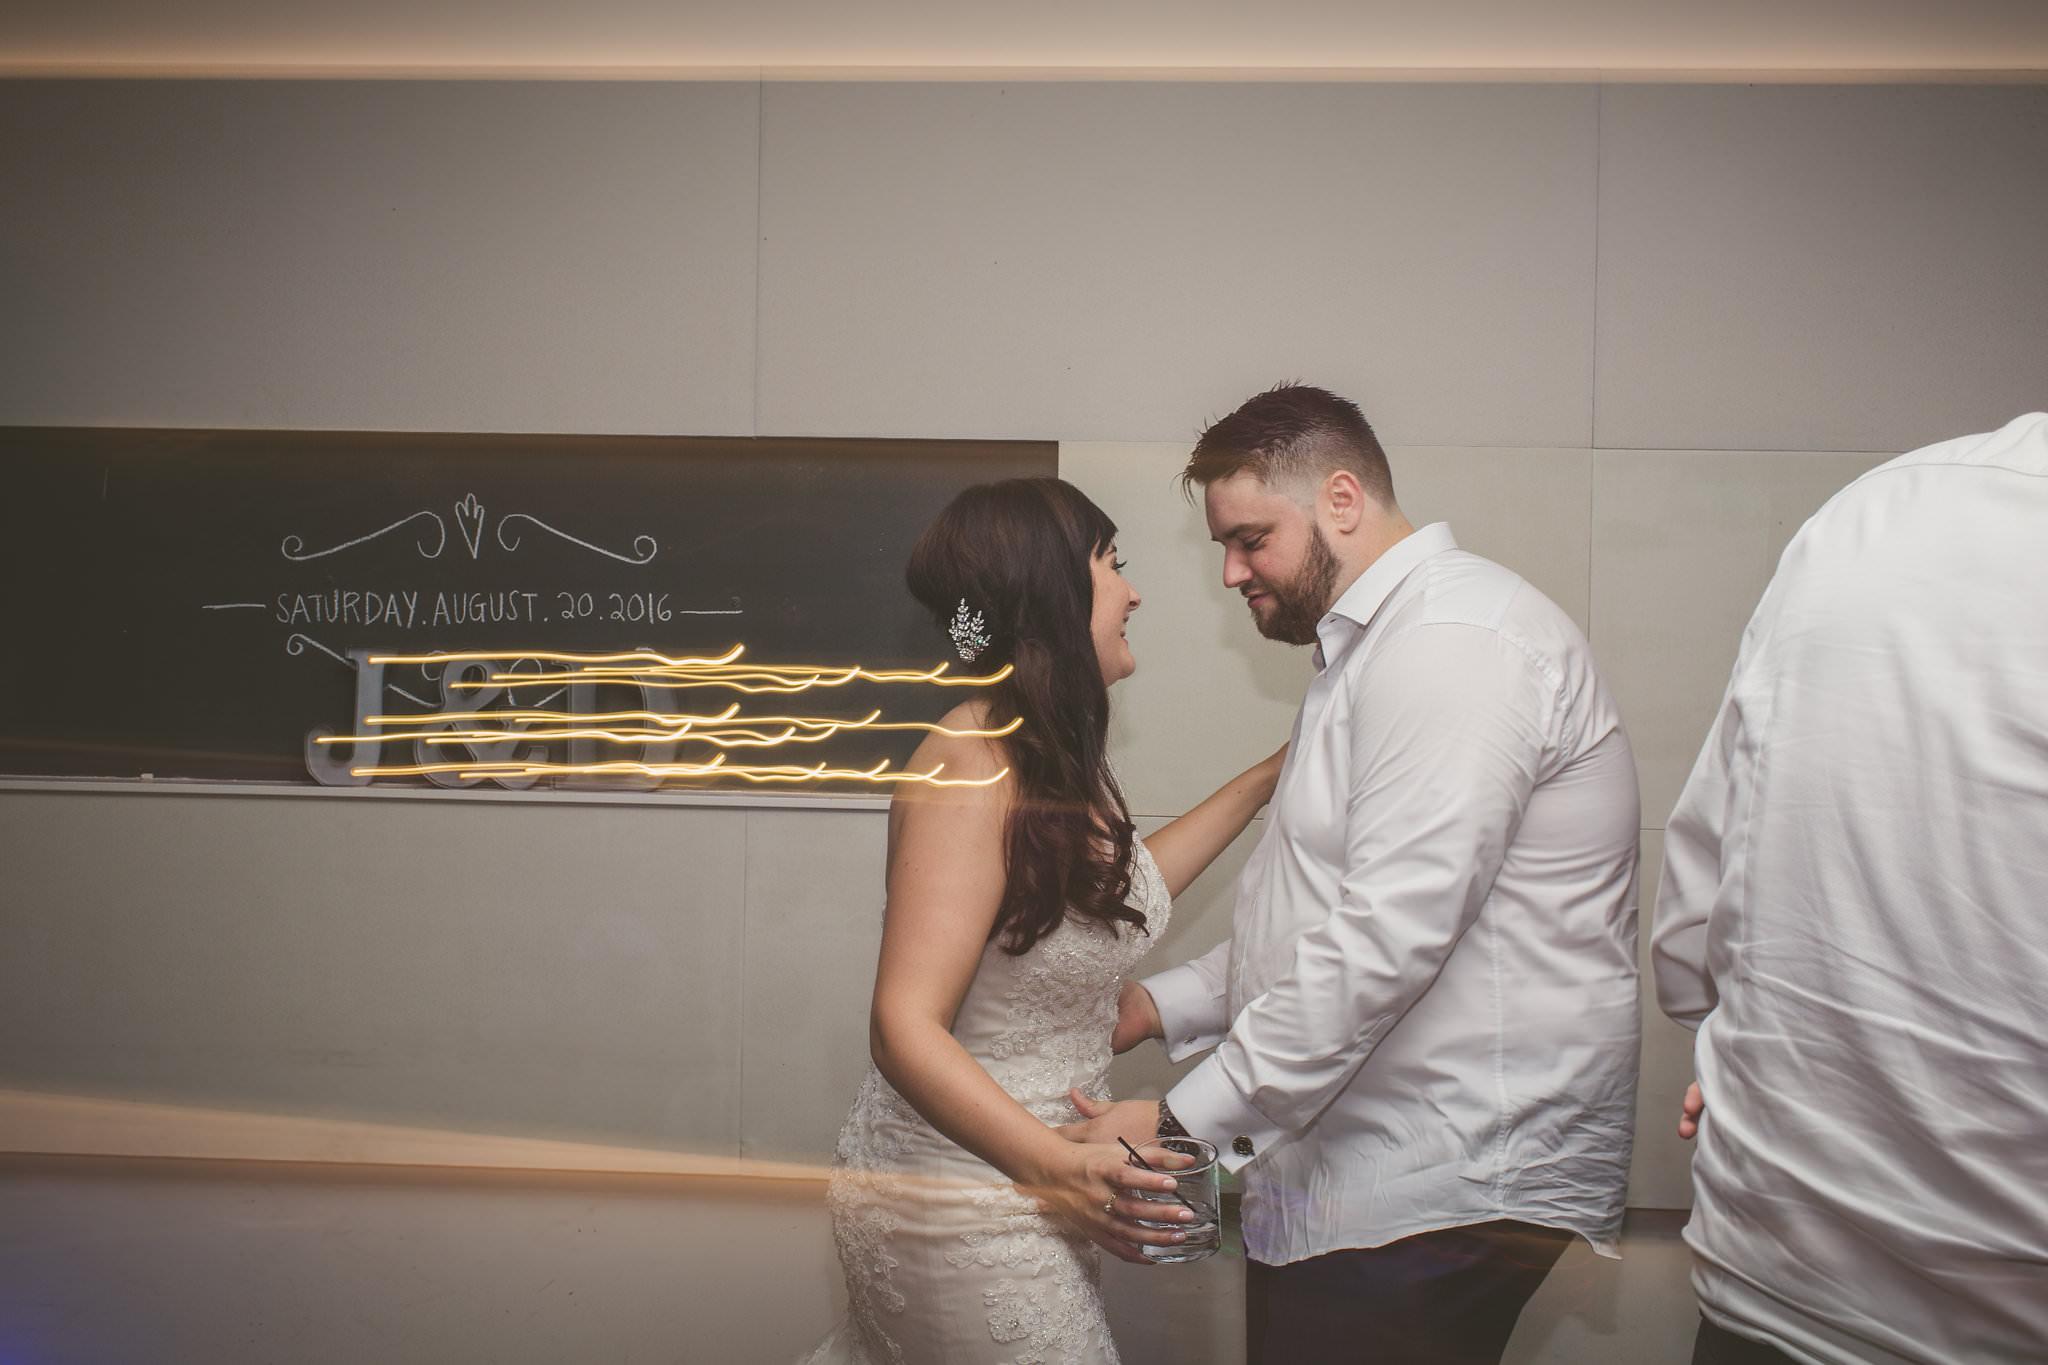 mildreds temple kitchen wedding, liberty village wedding, toronto restaurant wedding, restaurant wedding toronto